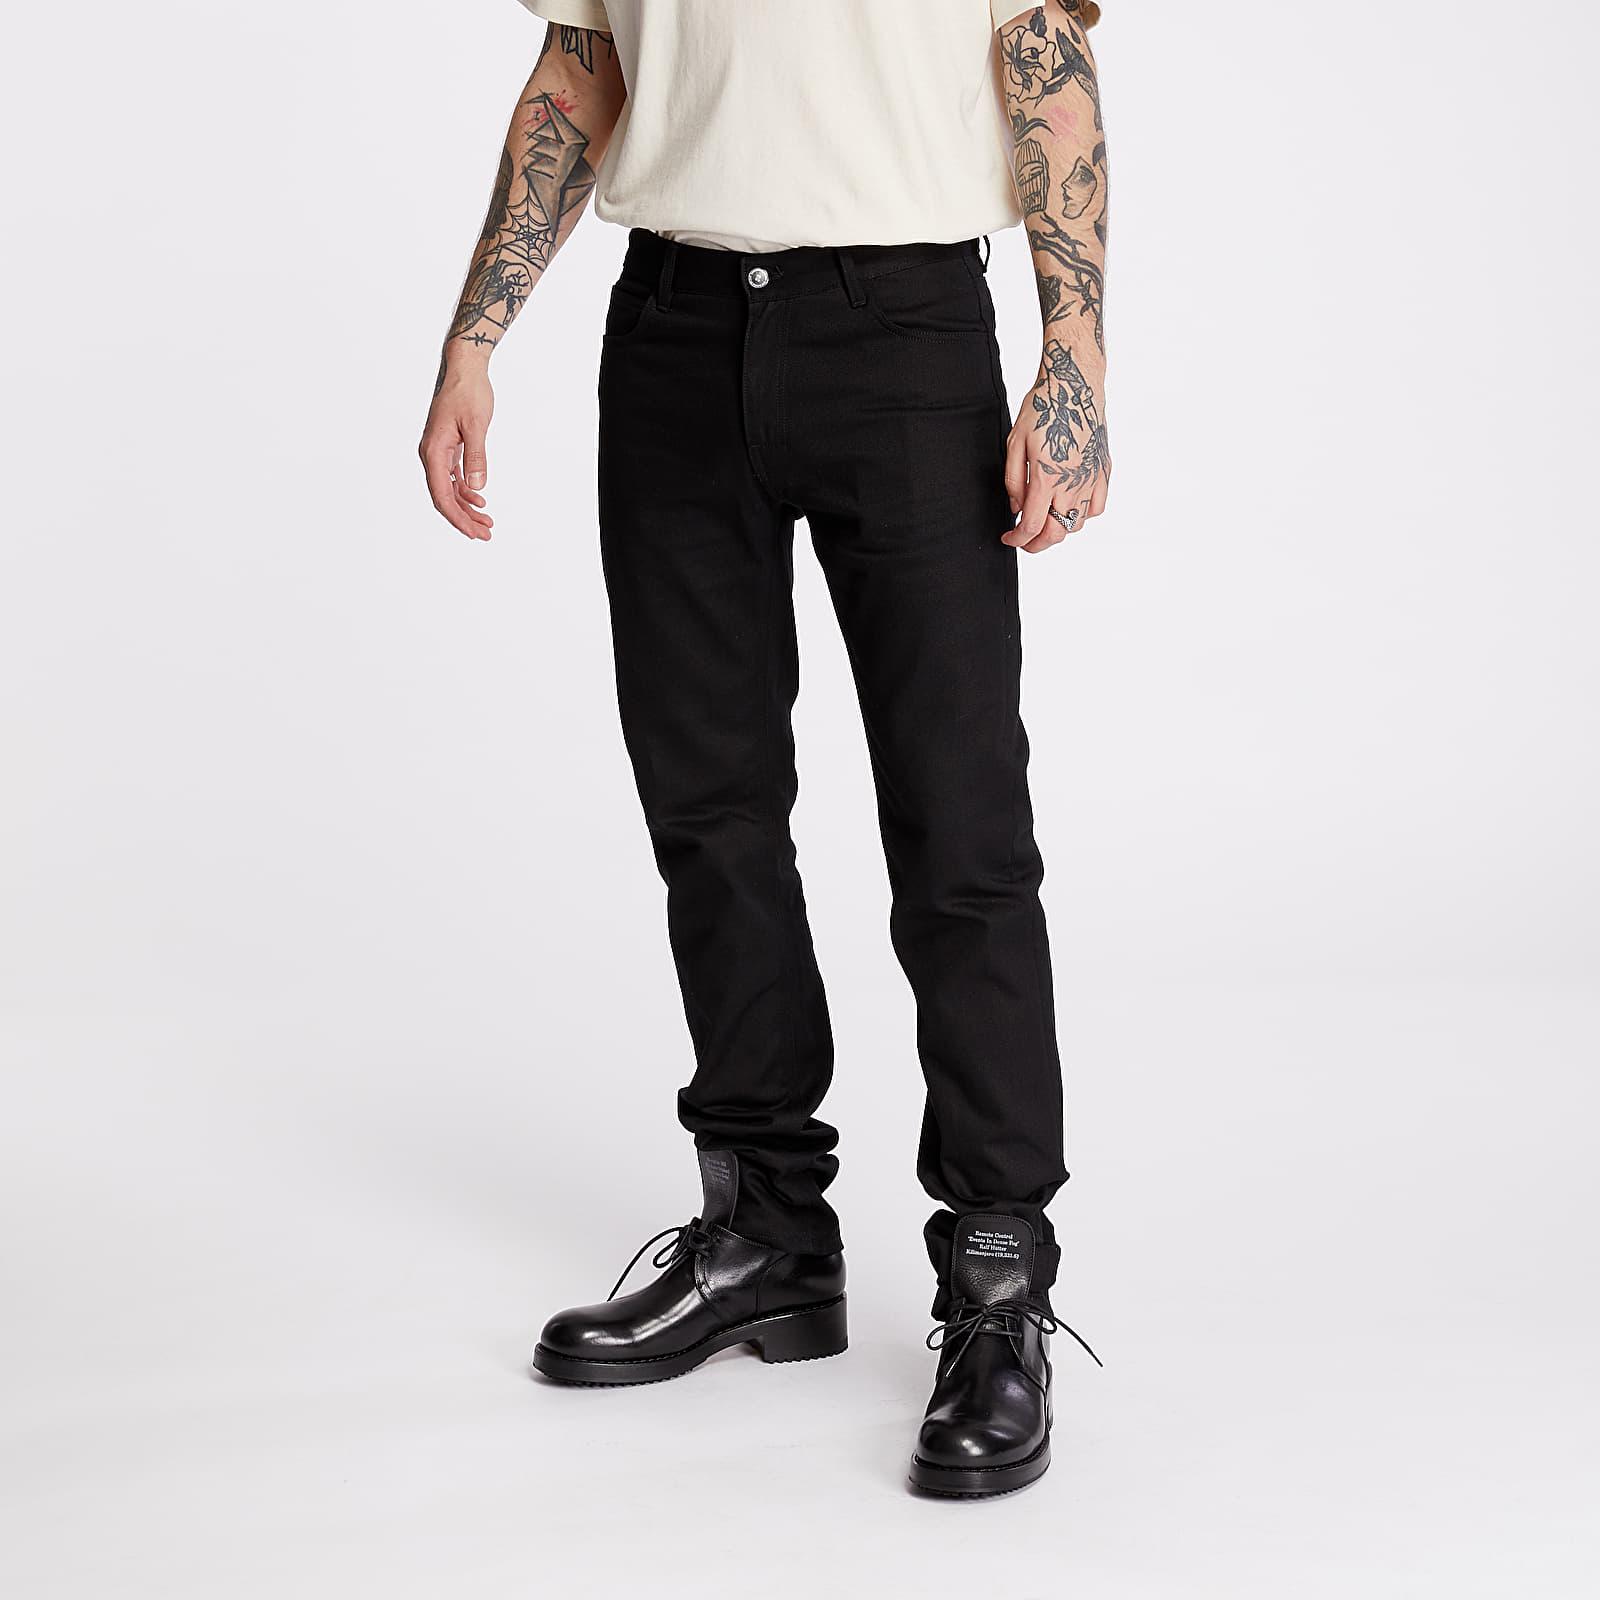 Pants and jeans RAF SIMONS Slim Fit Suspender Denim Pants Black